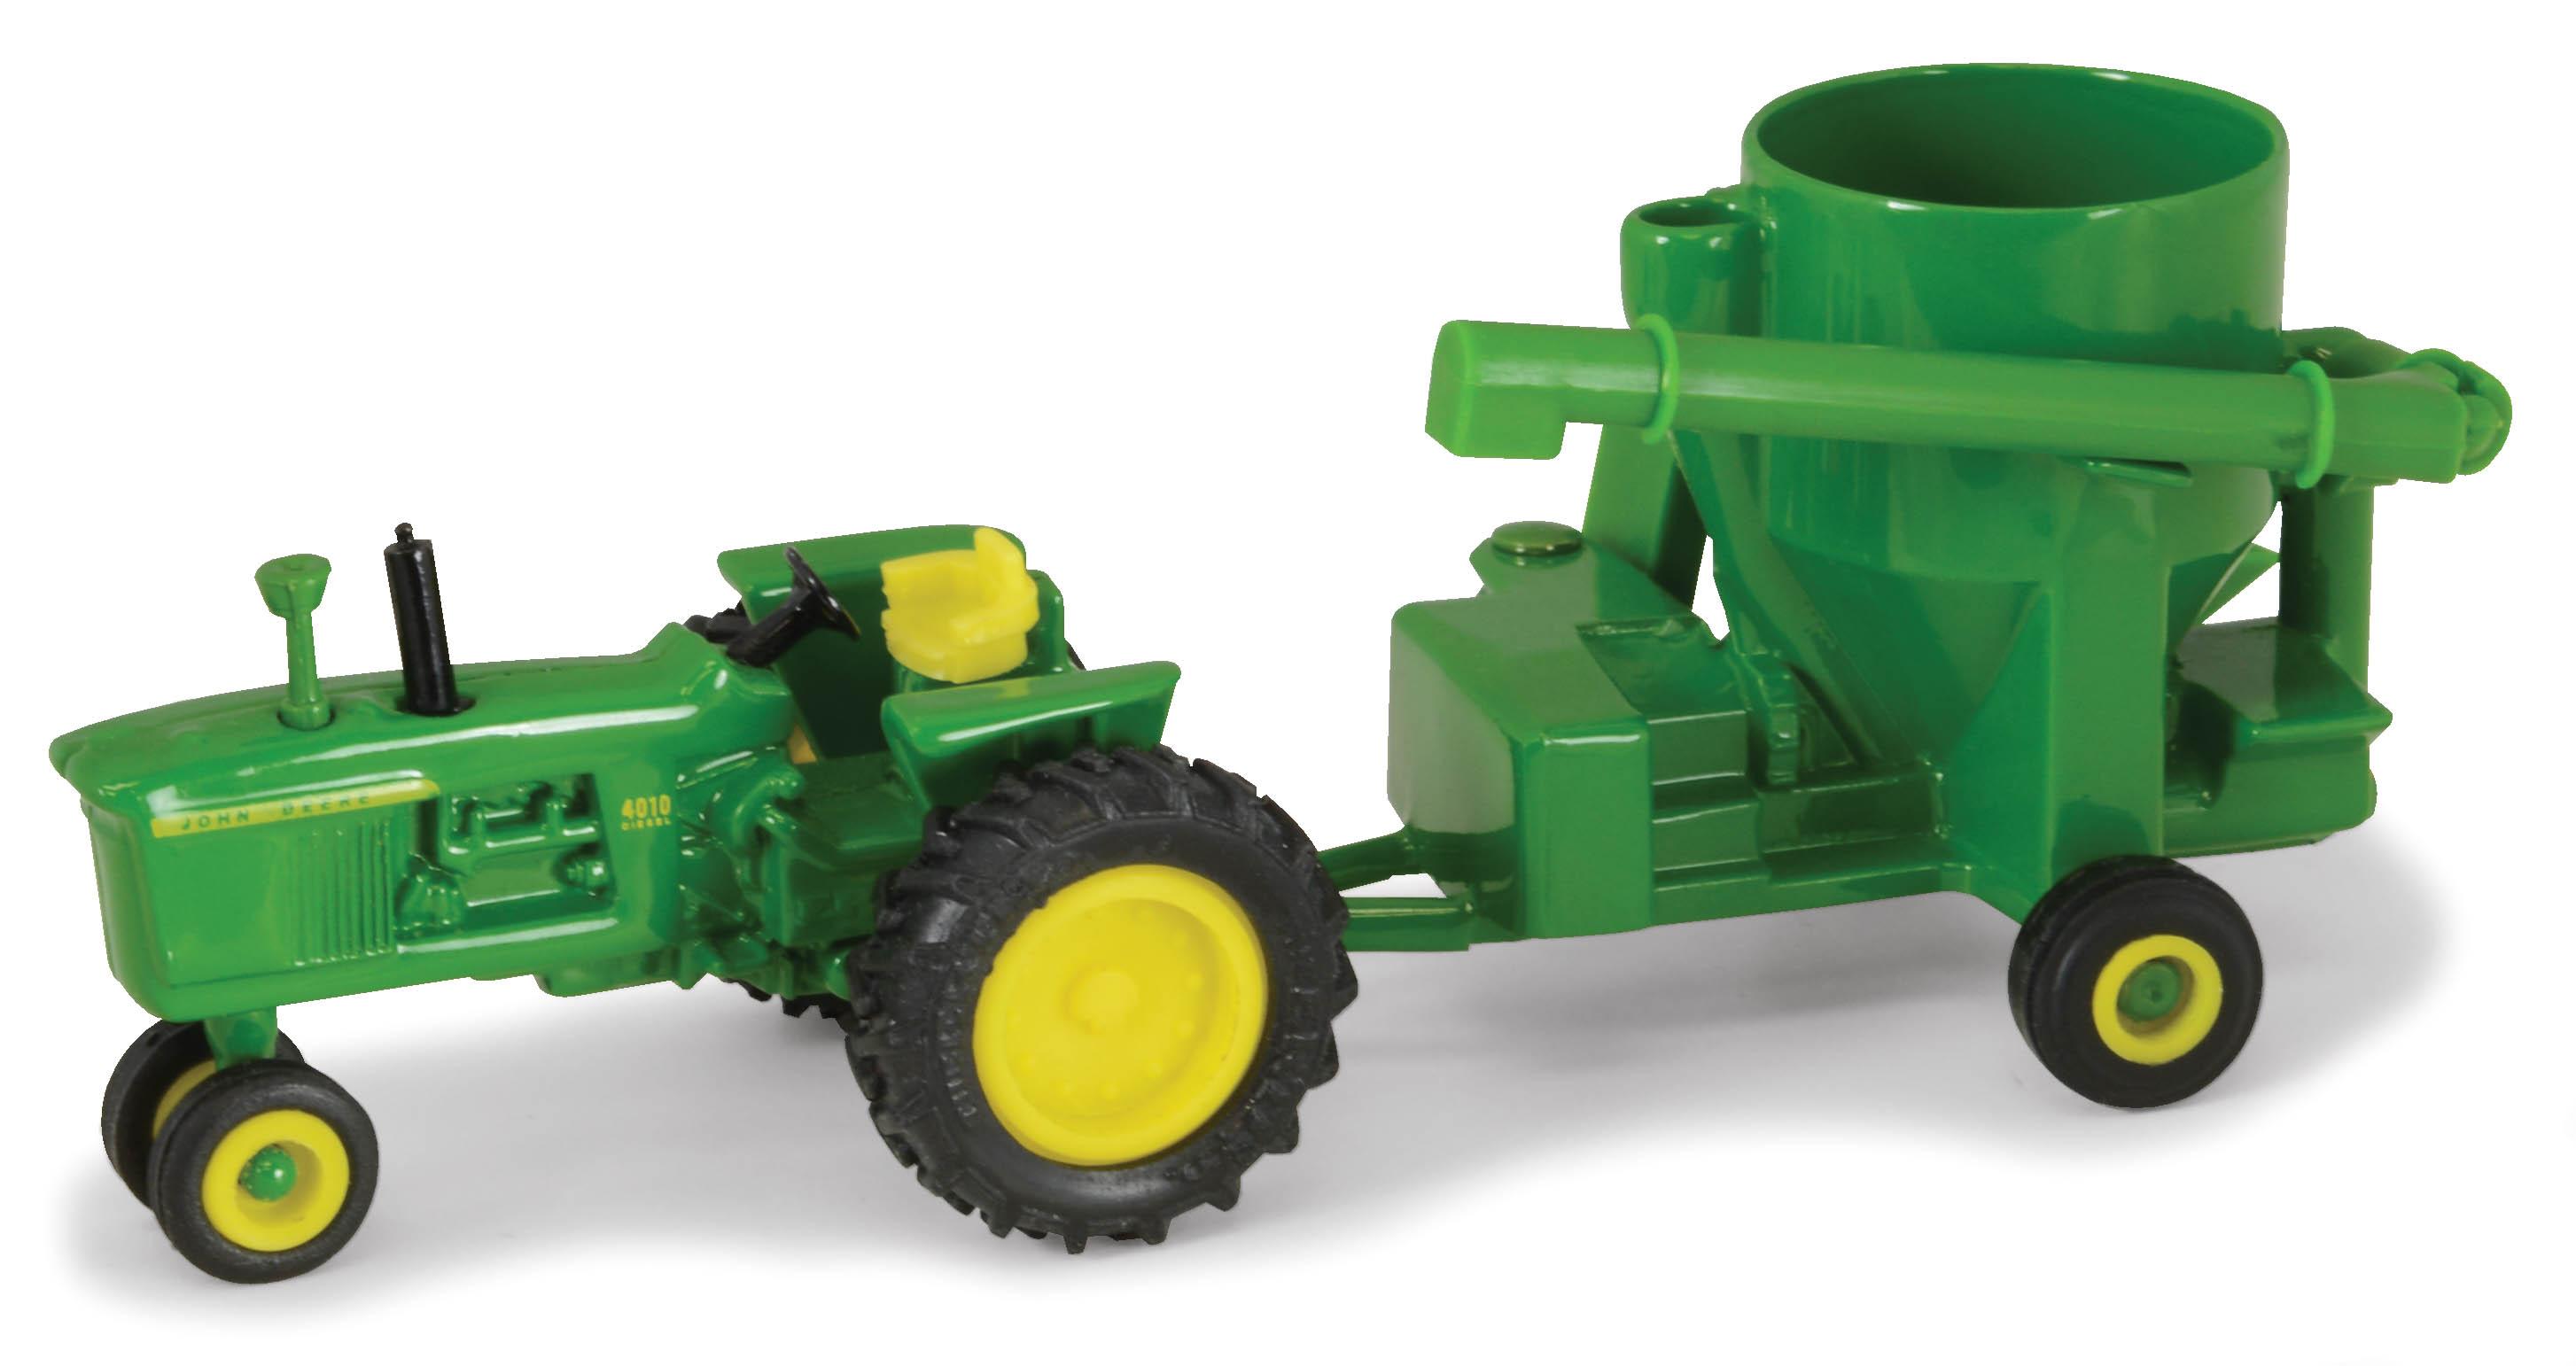 John Deere 4010 & Mixer Grinder   Down On The Farm